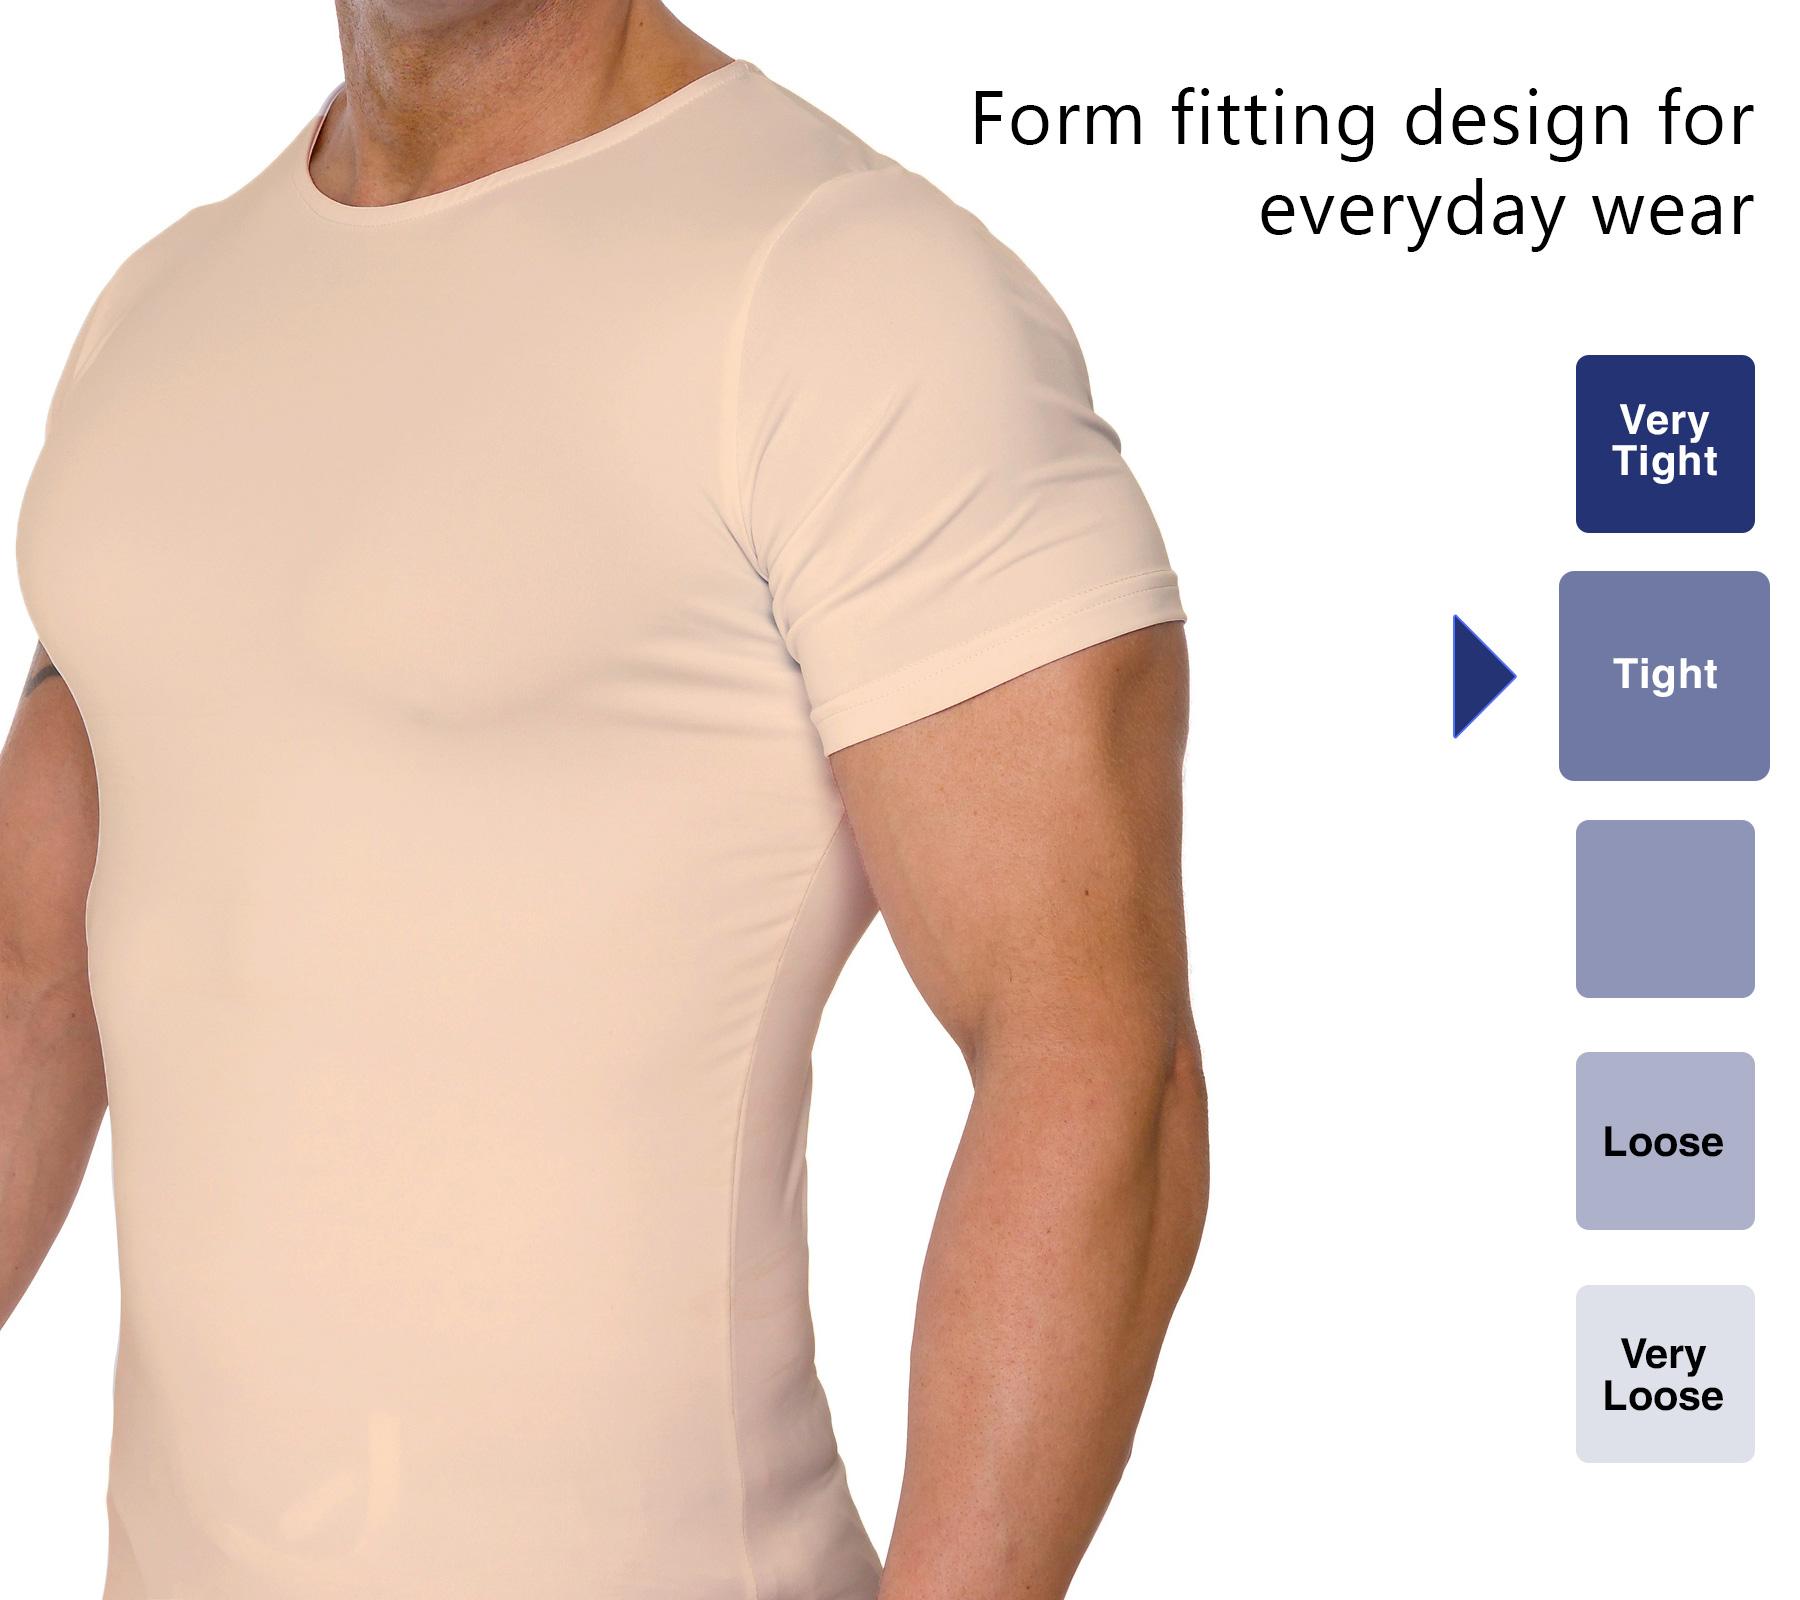 LISH-Men-039-s-Slimming-Compression-Body-Shaper-Gynecomastia-Undershirt thumbnail 16